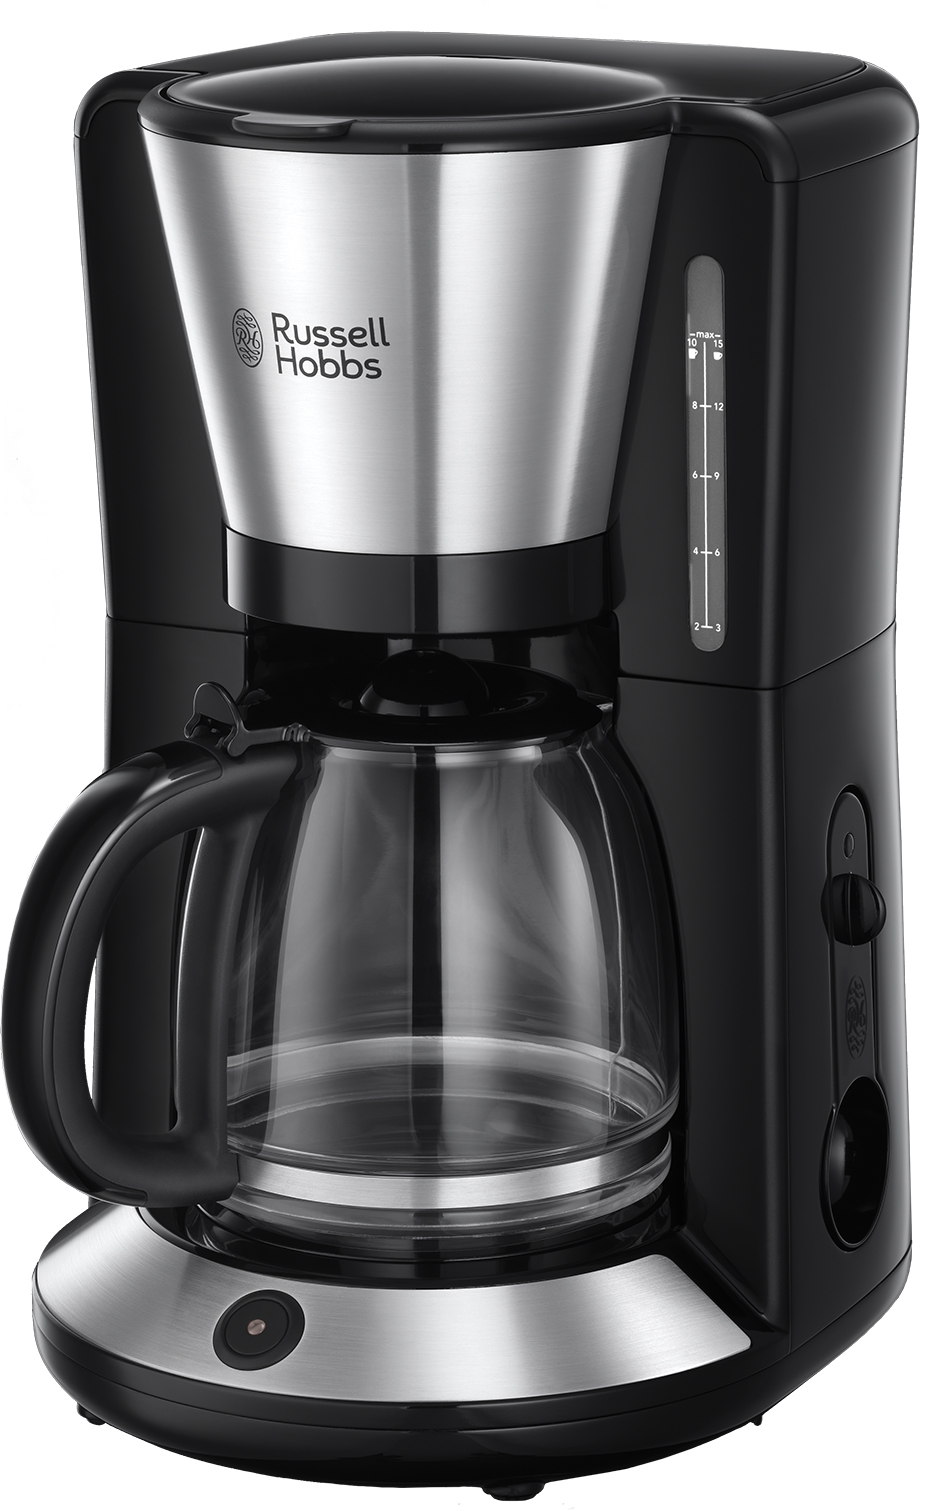 Russell Hobbs Glas-Kaffeemaschine Adventure mit WhirlTech-Brühtechnologie.